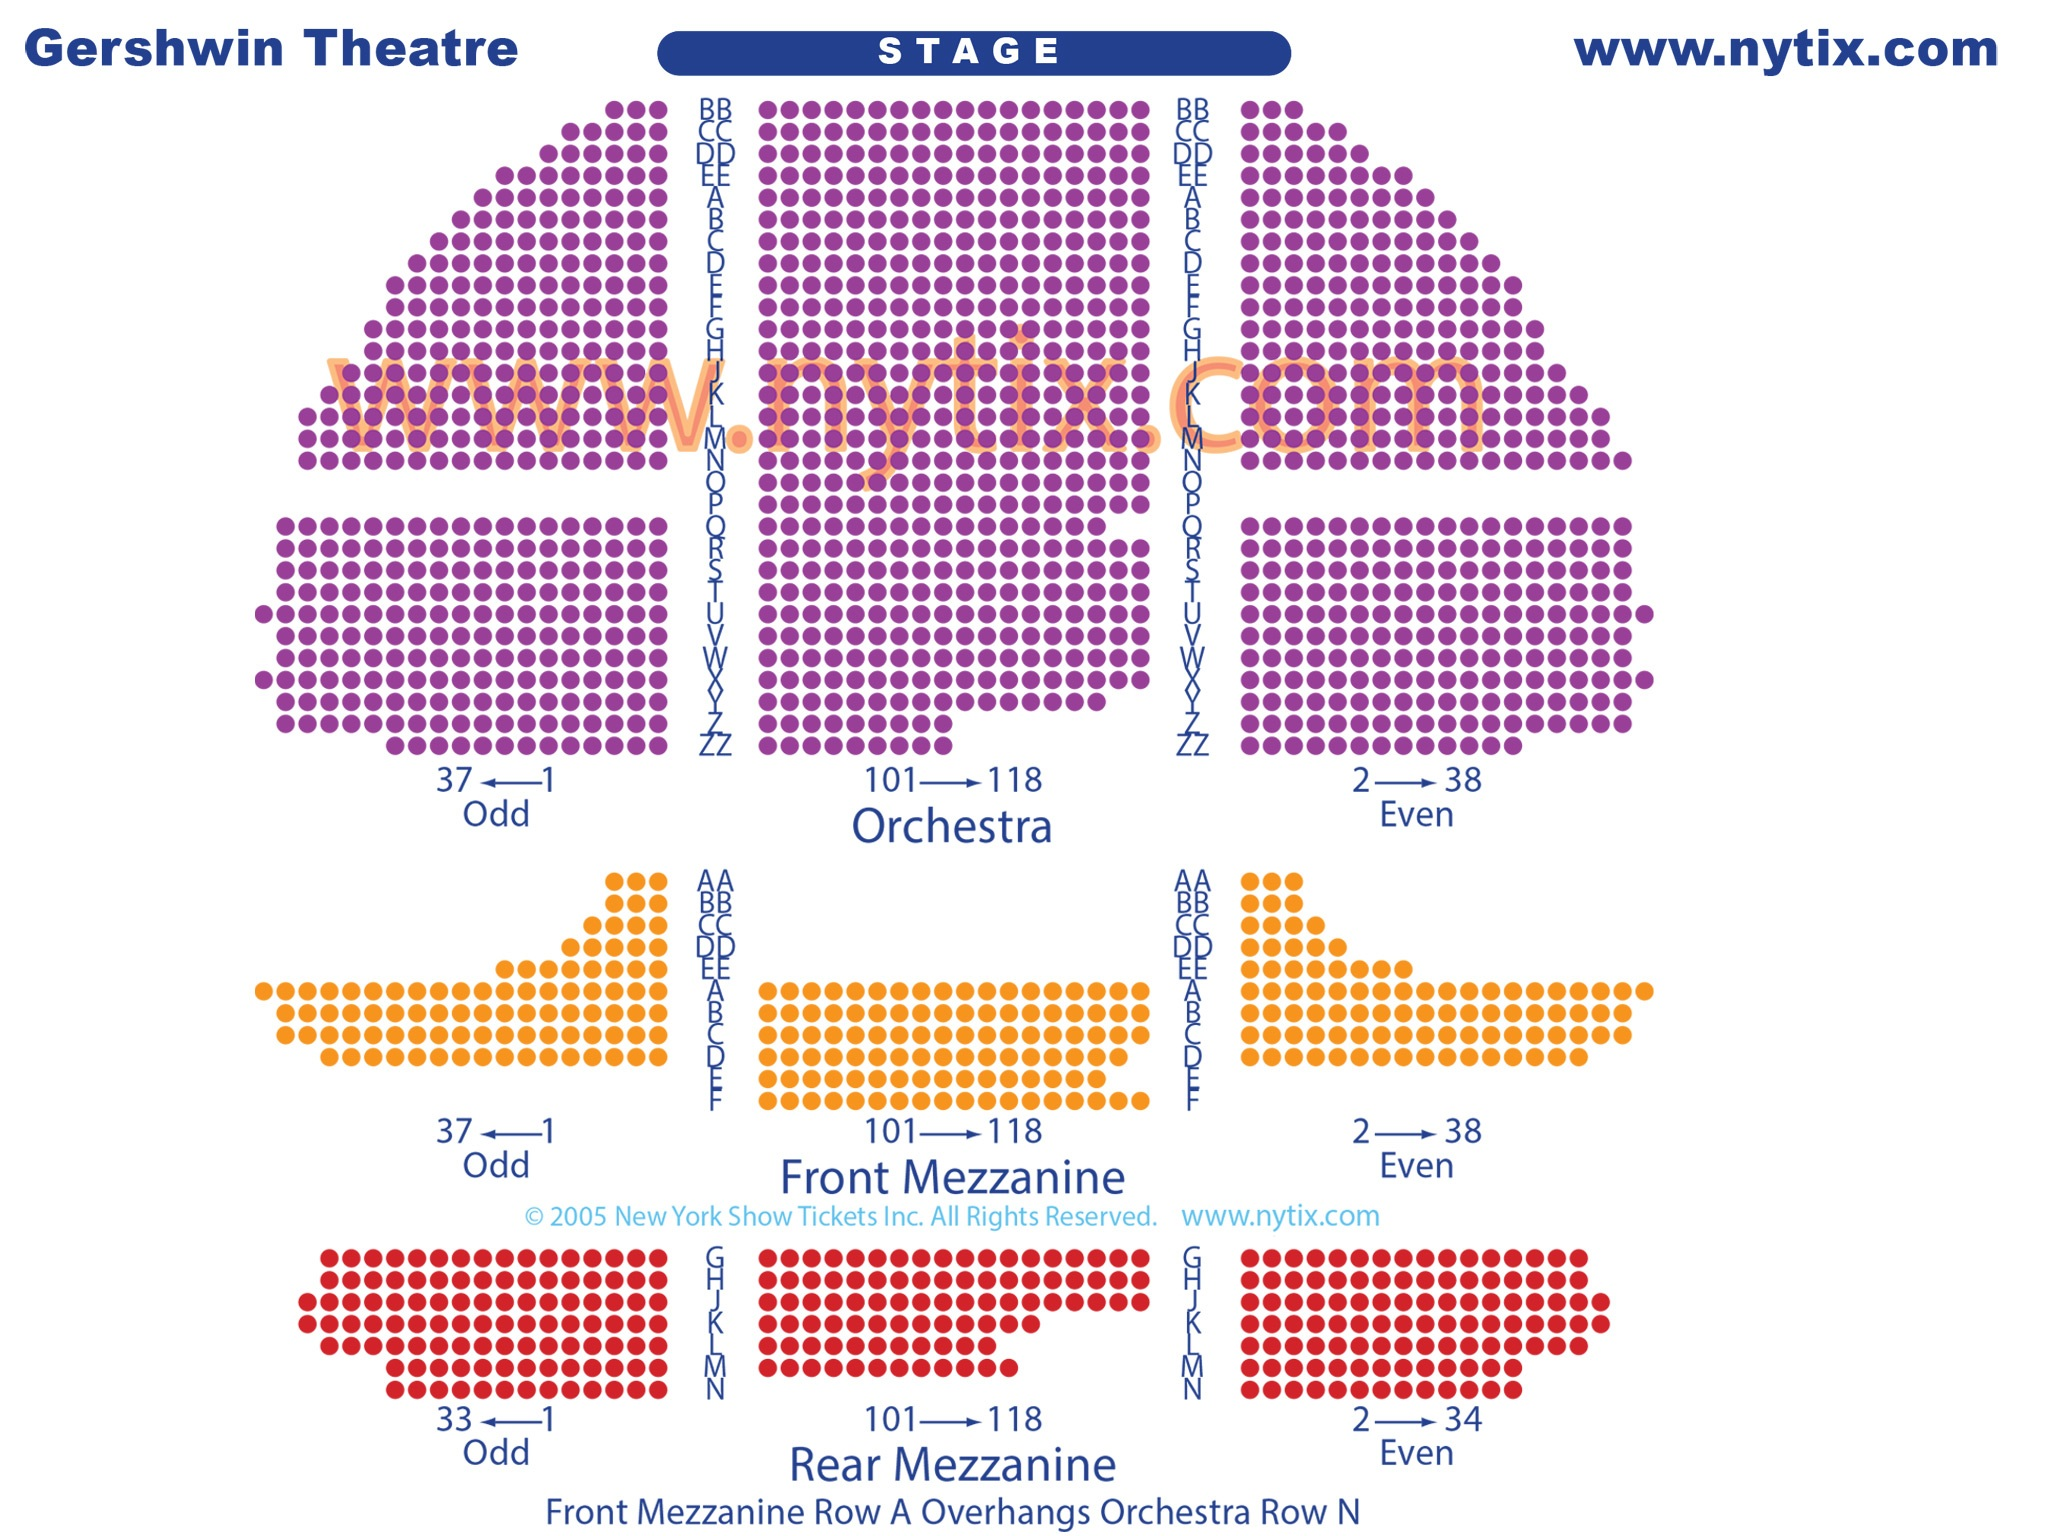 Broadway Gershwin Seating Chart